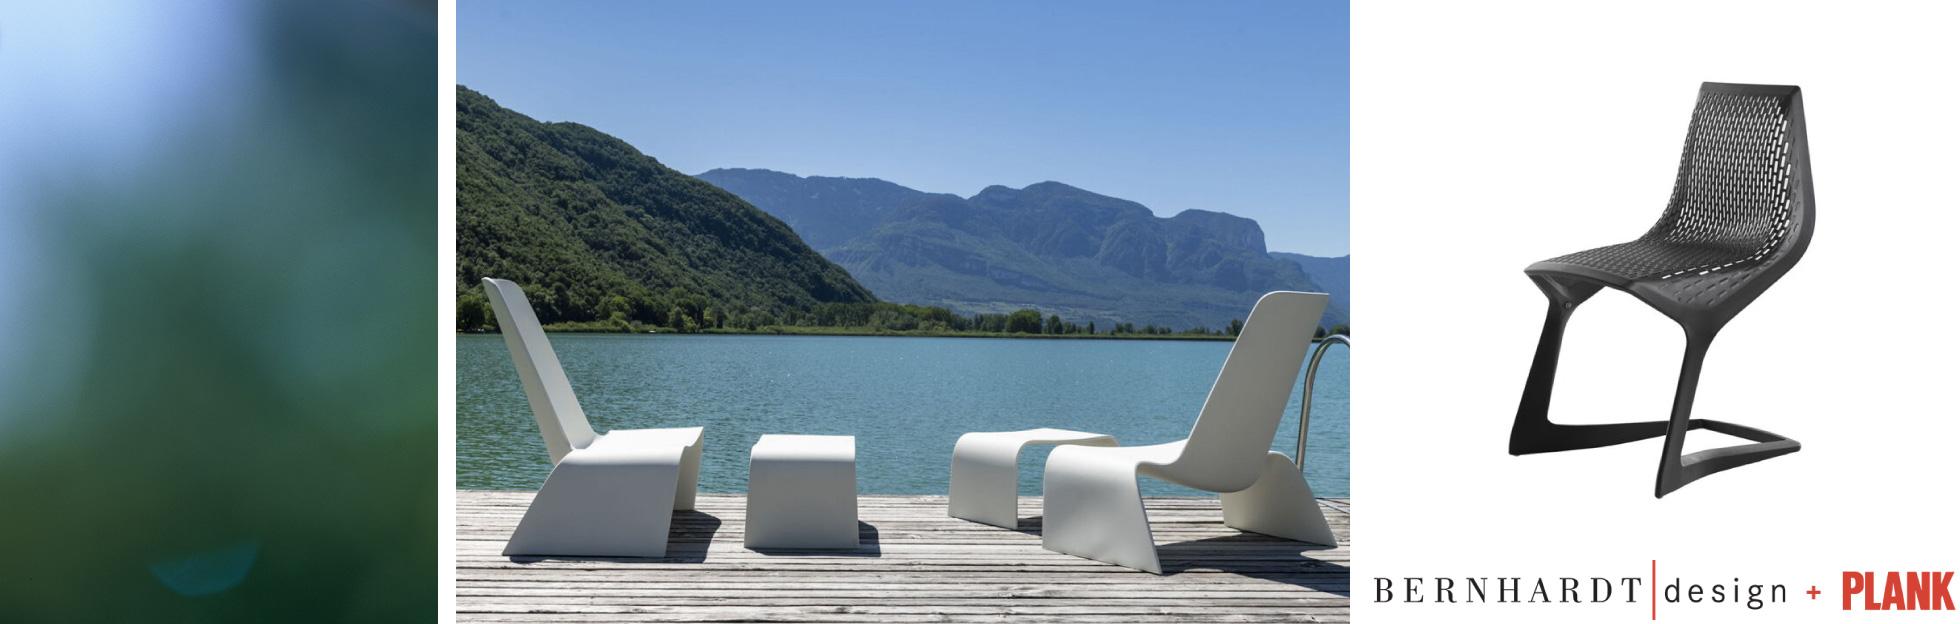 bernhardt Design Plank